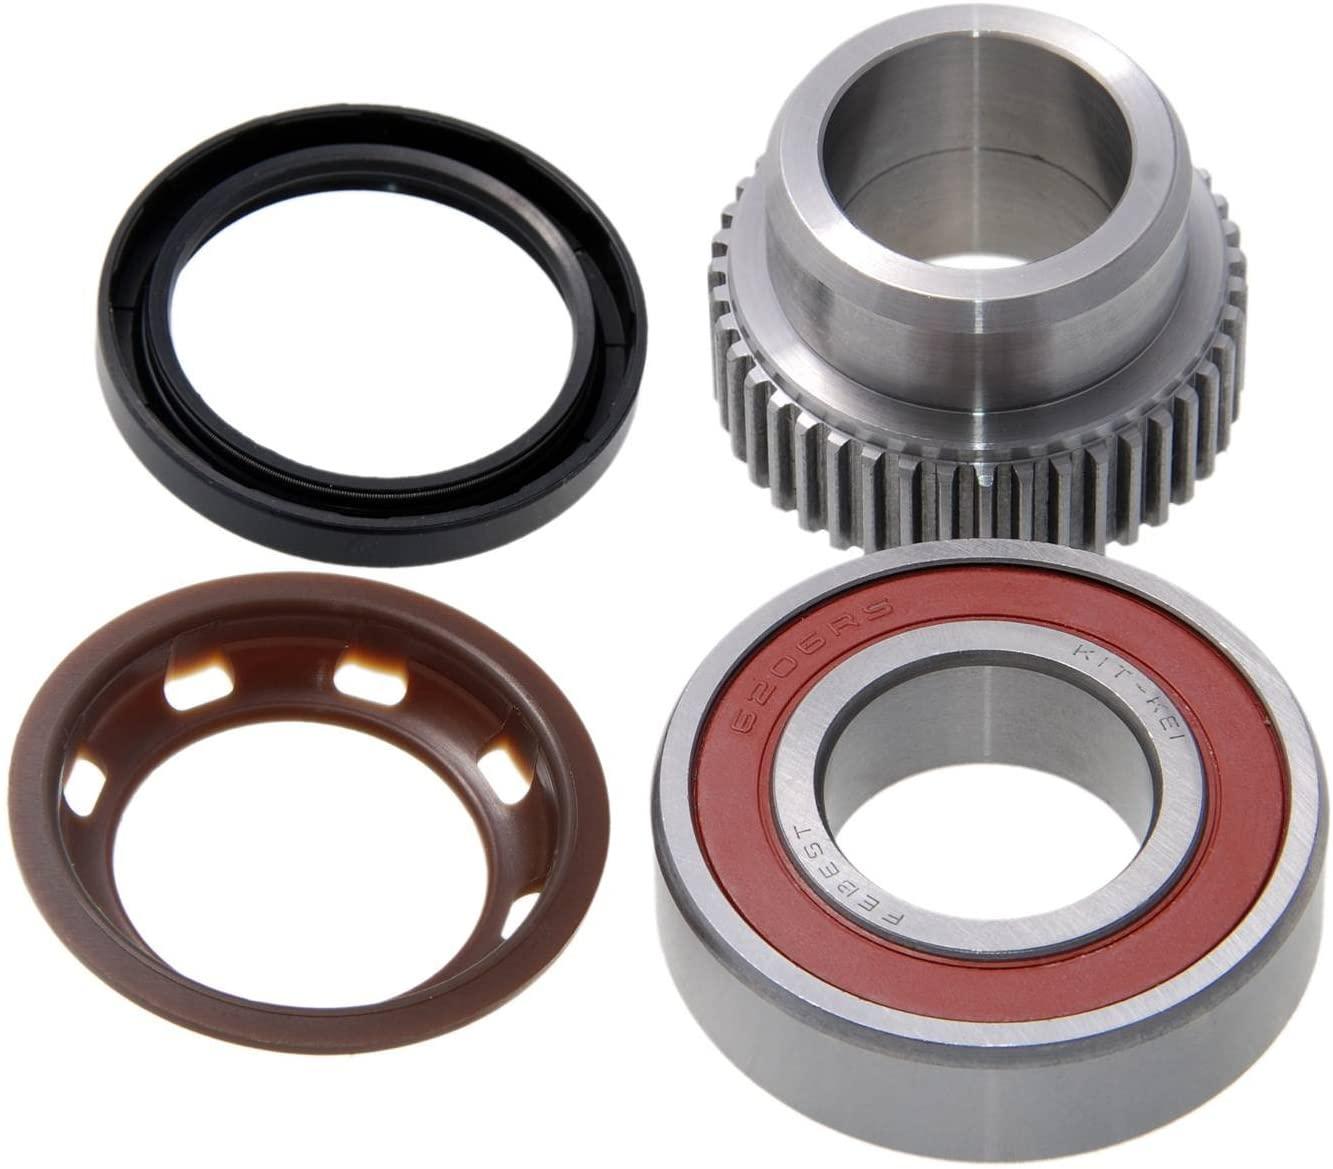 43588-72000 / 4358872000 - Ball Bearing Kit Rear Axle Shaft (30X62X16) For Su...